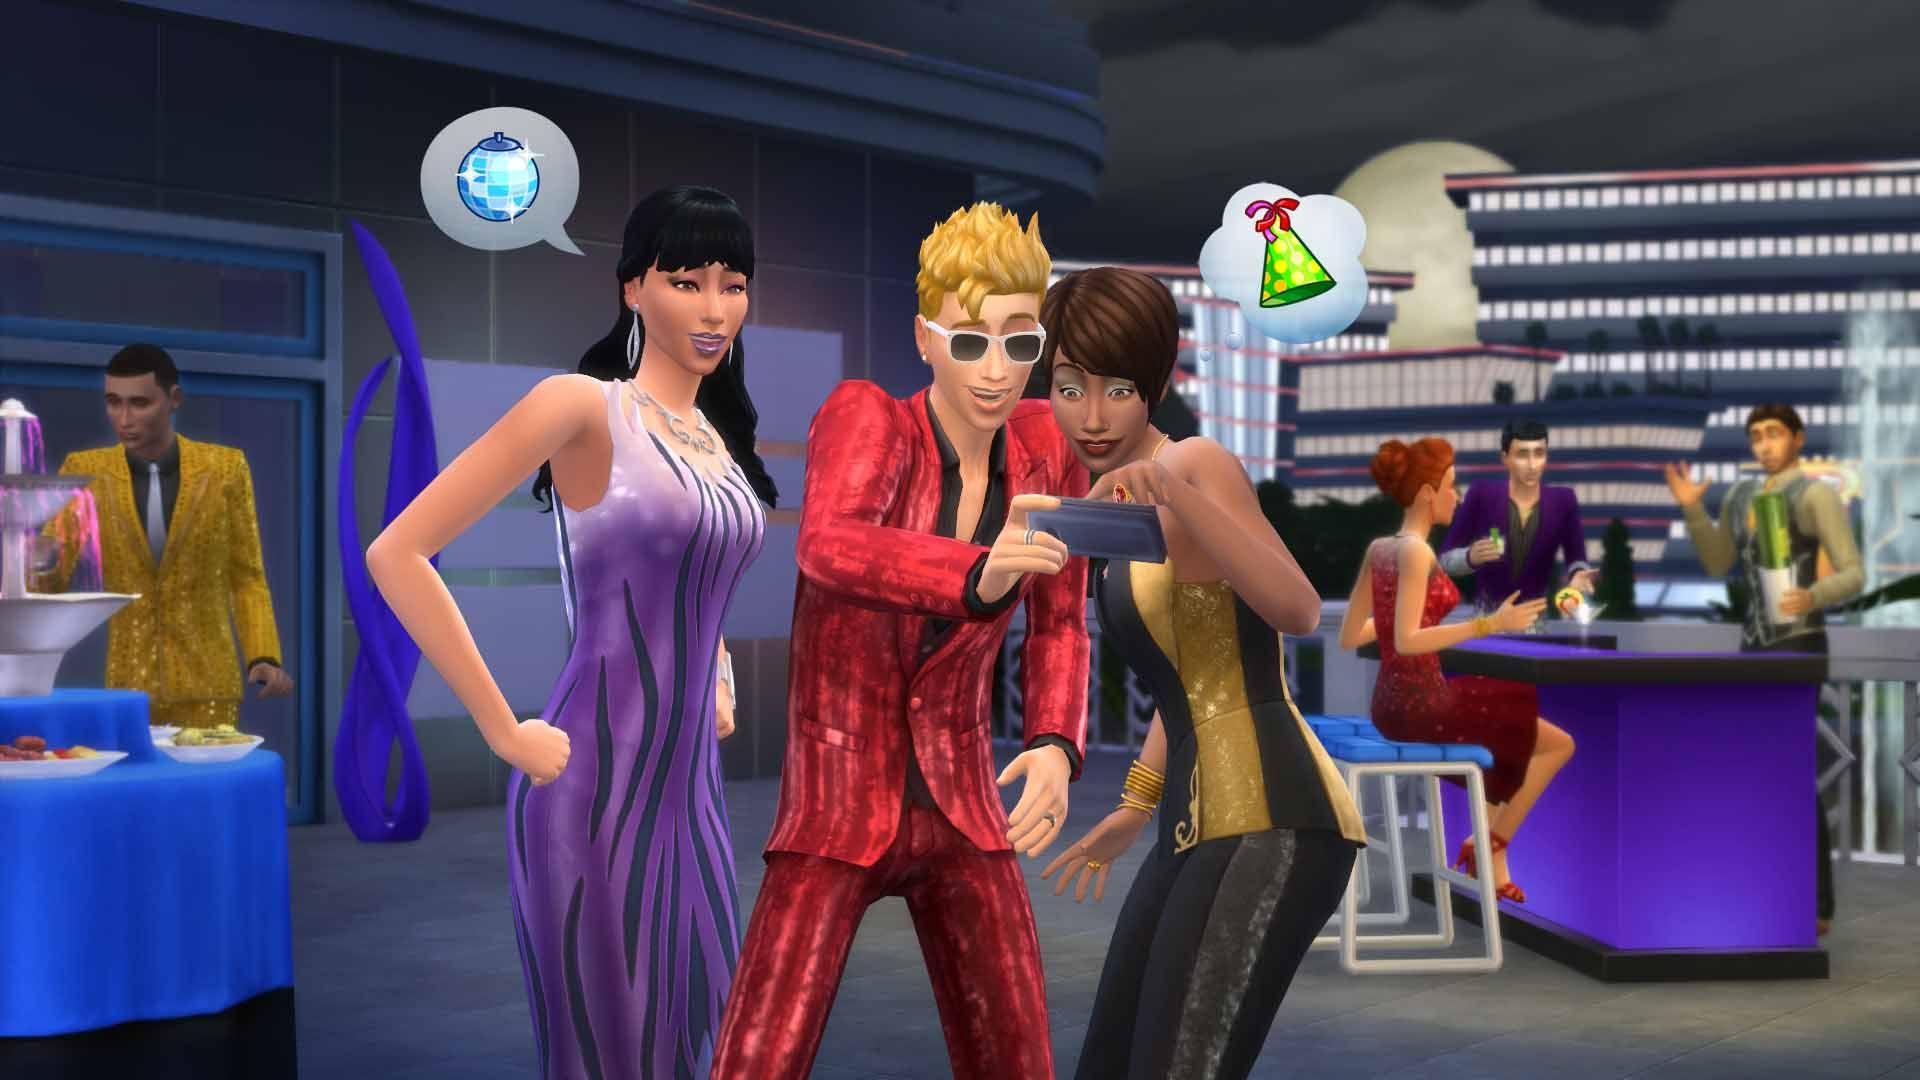 Die Sims 4 Luxus Party Accessoires Für Pcmac Origin